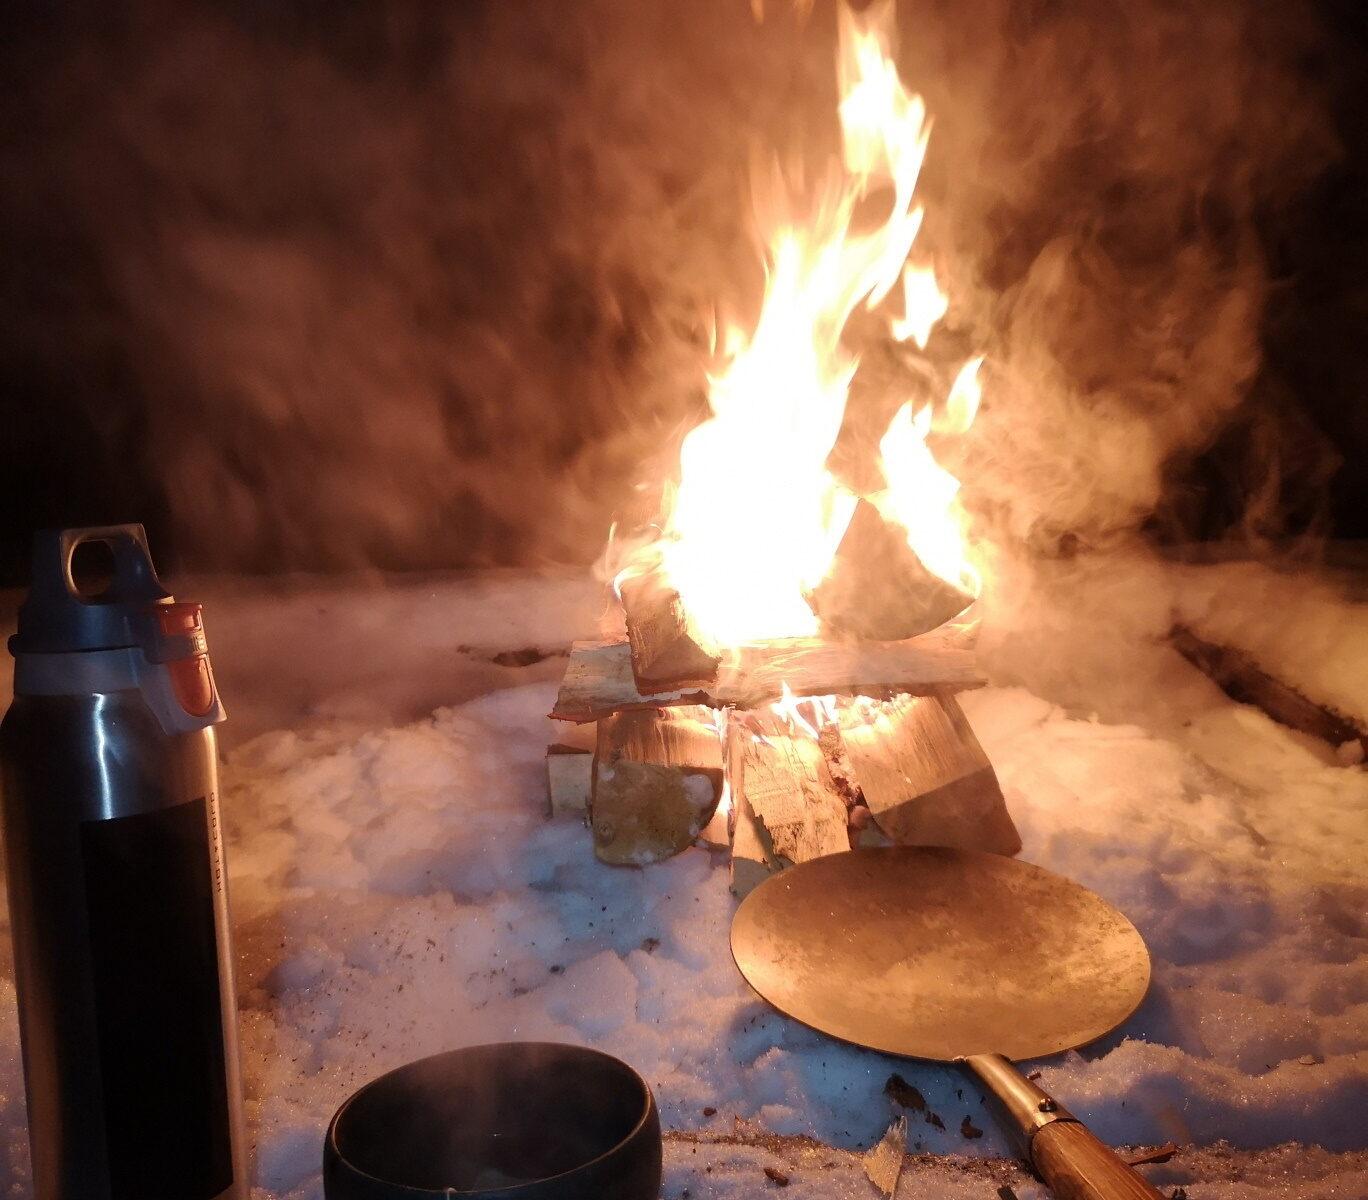 Matlagning över öppen eld_Dorotea2